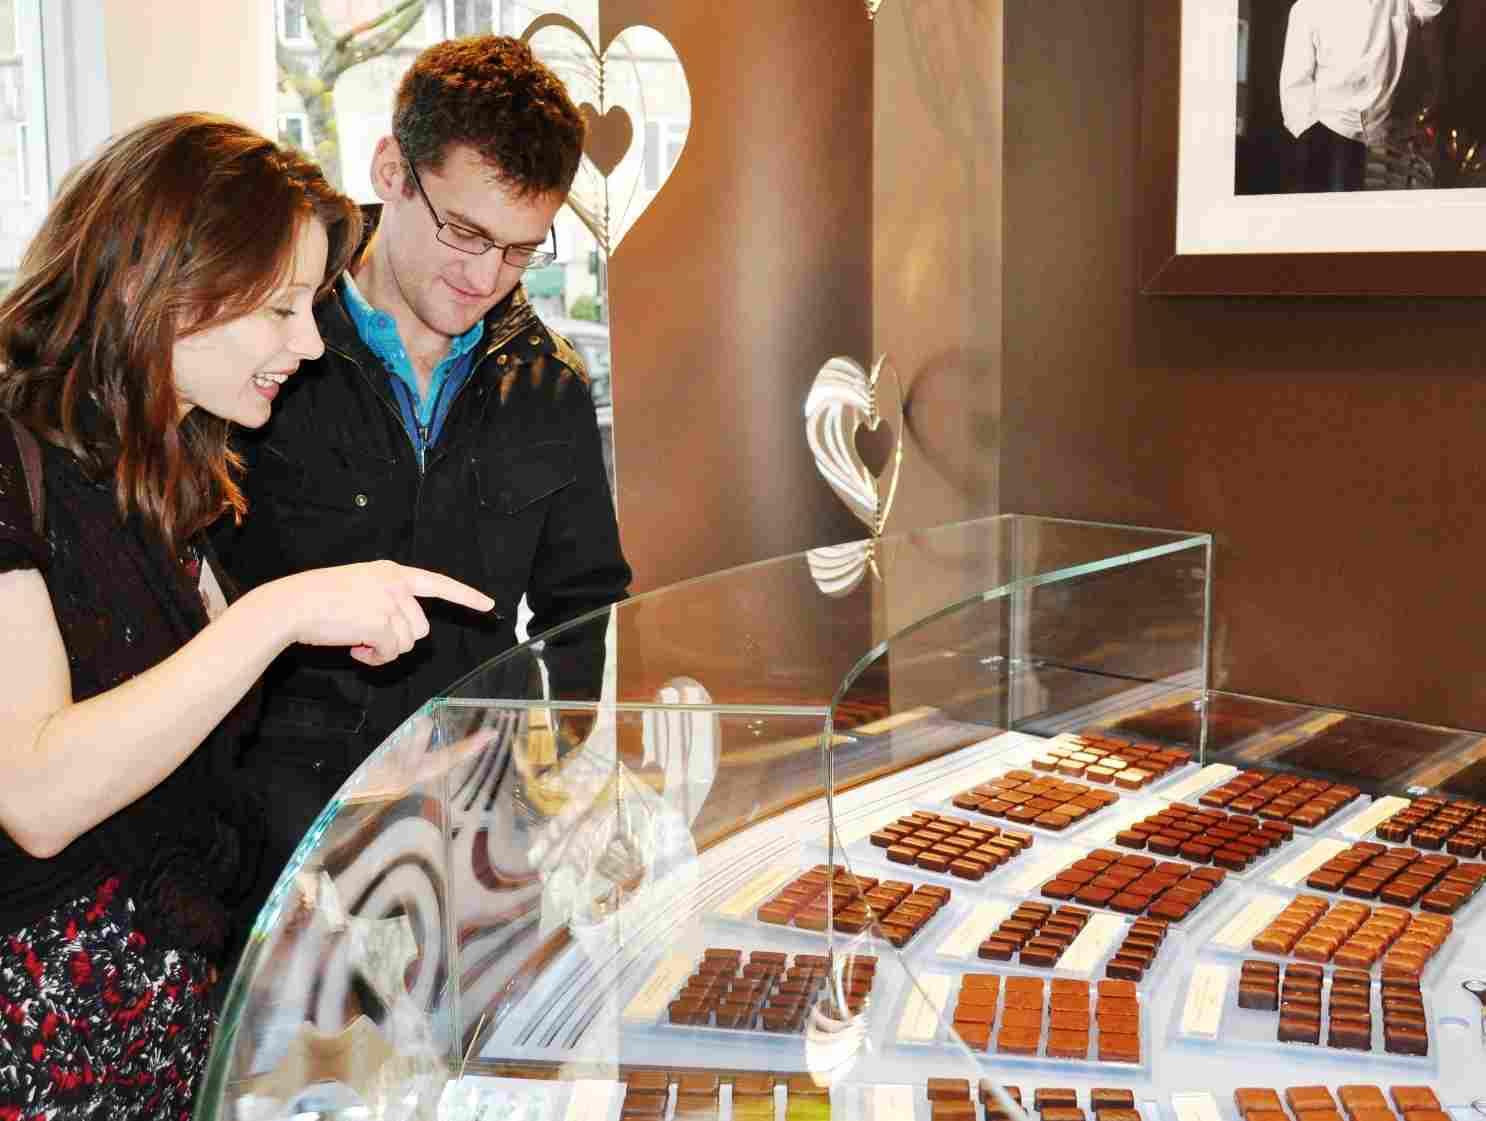 Chelsea Chocolate Ecstasy Tour in Pierre Herme